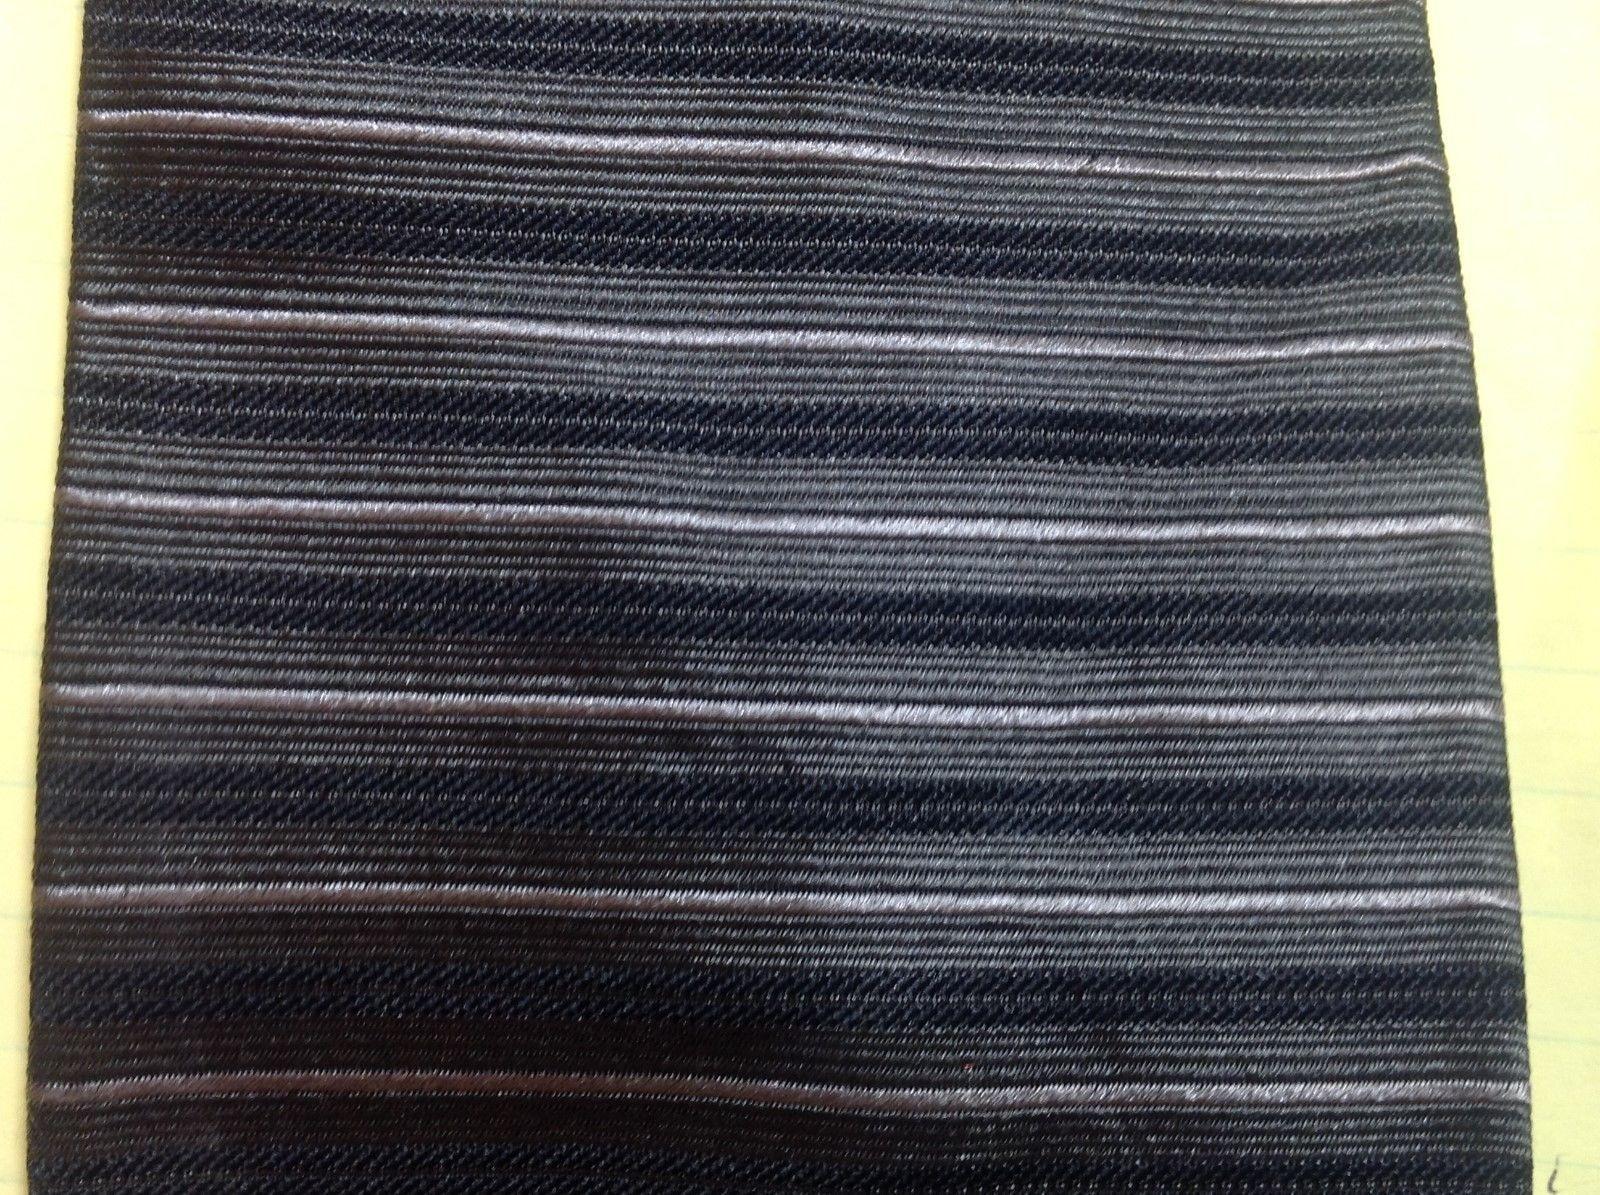 Geoffrey Beene Horizontally Striped Multicolor Silk Tie